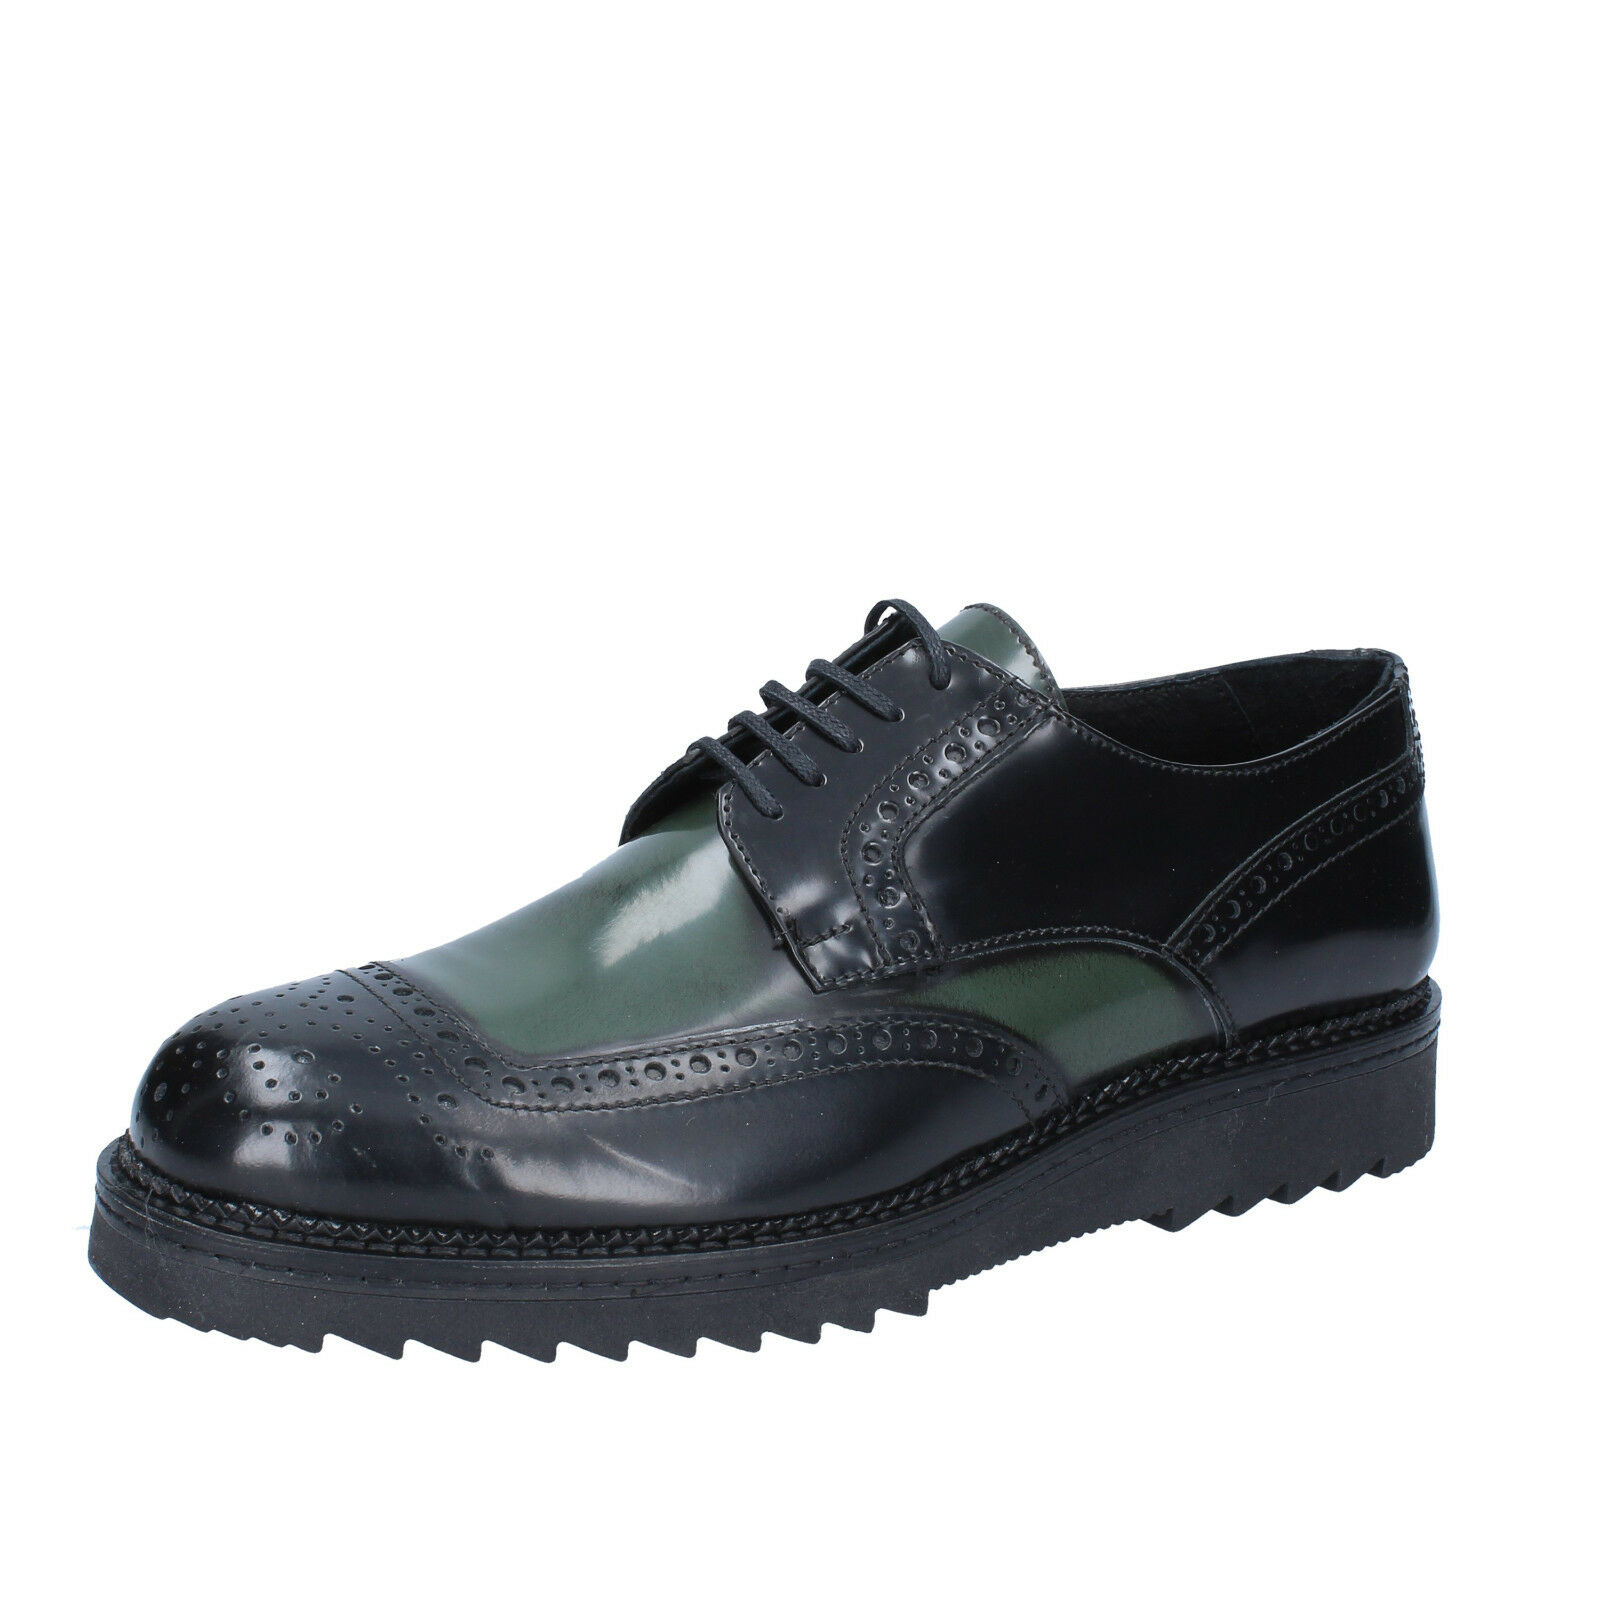 Men's schuhe SALVO BARONE 11 (EU 44) Leder elegant schwarz green shiny Leder 44) BZ185-F b1c1de